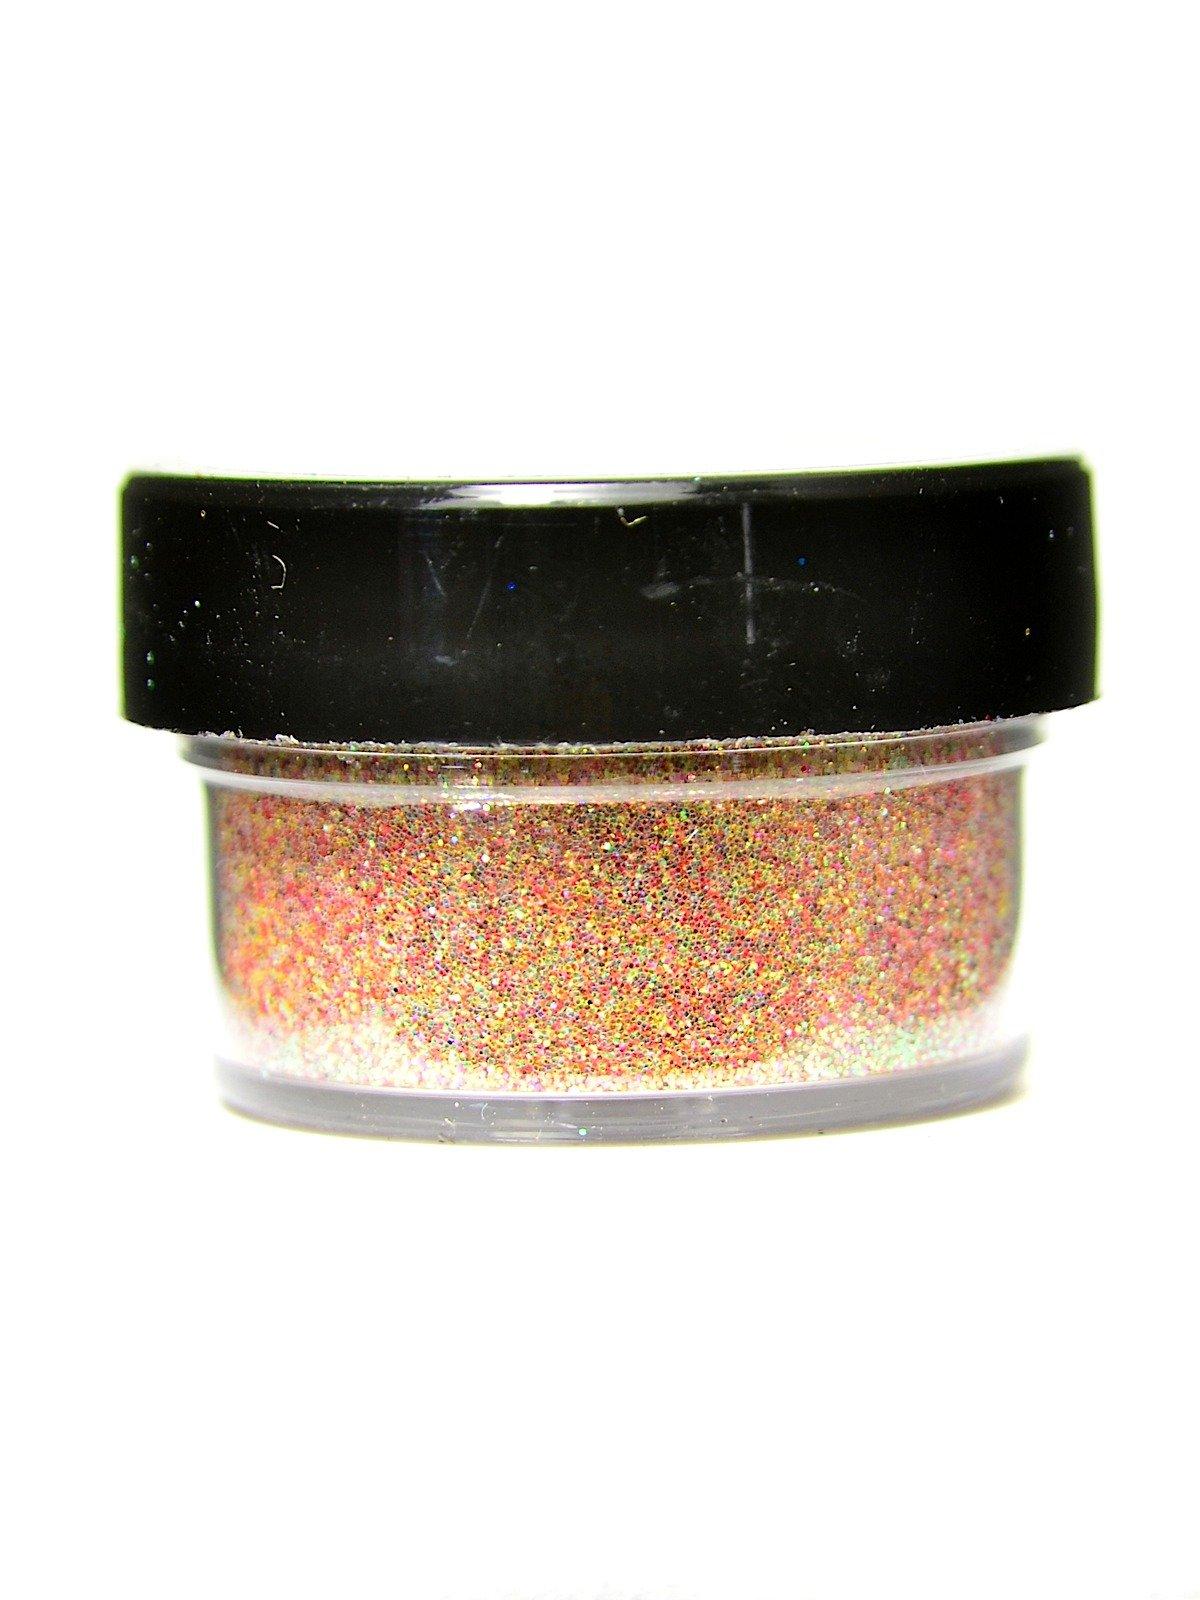 Art Glitter 196 Lion's Mane Ultrafine 1/4 oz jar